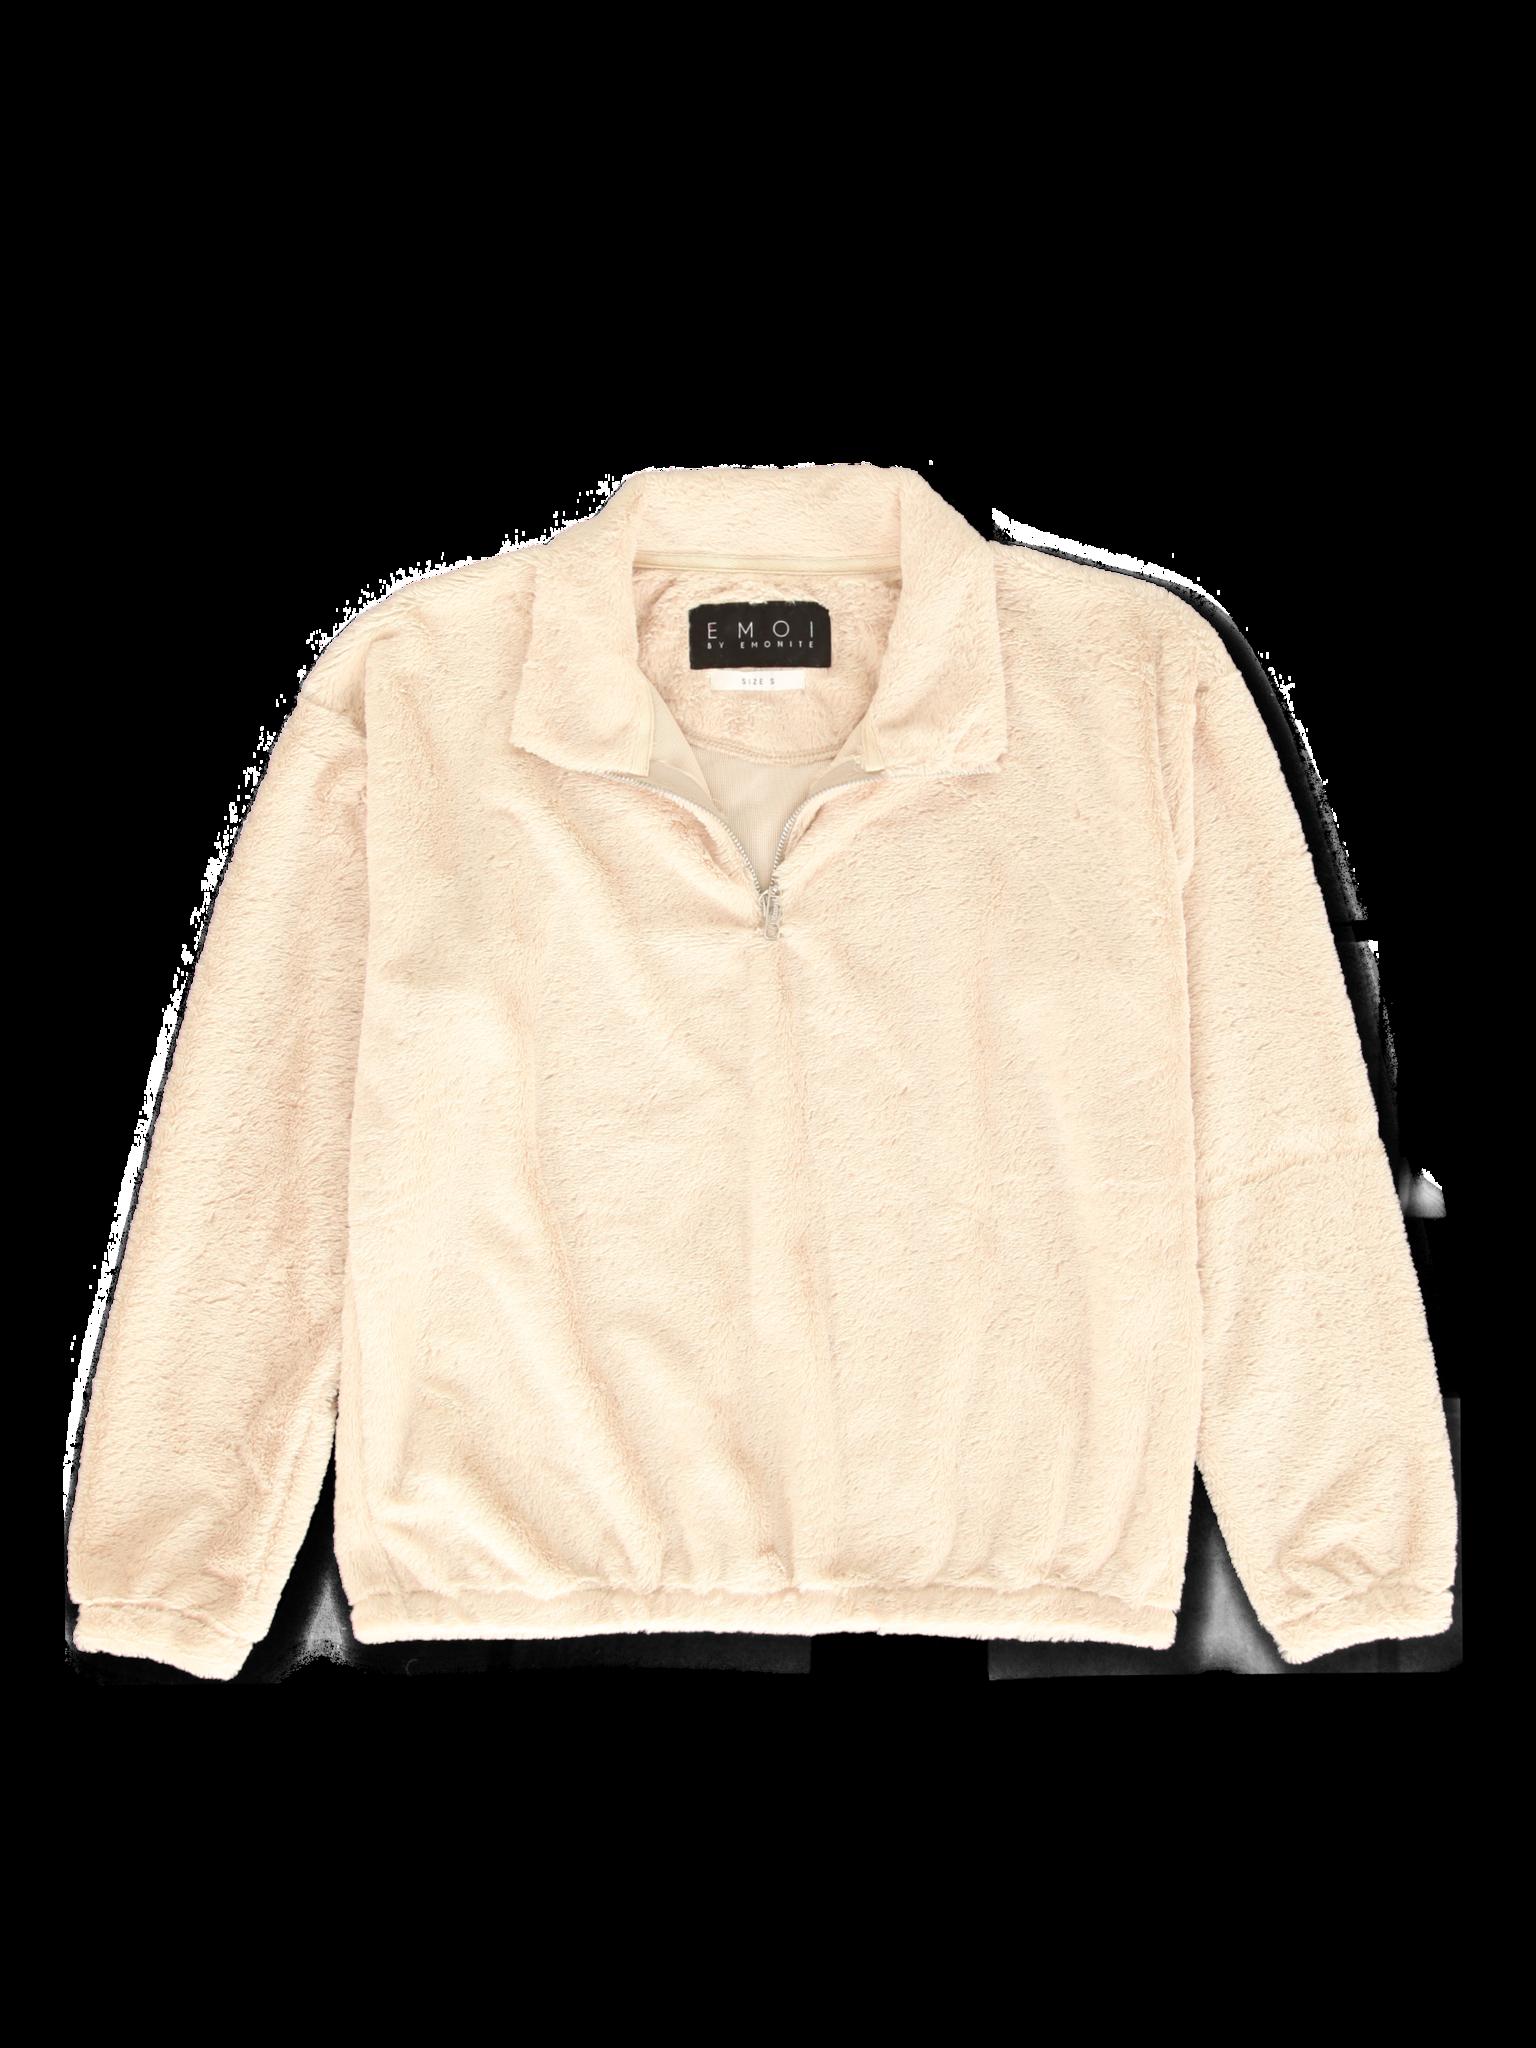 All Brands | Winterproducts Ladies | Sweatshirt | 24 pcs/box